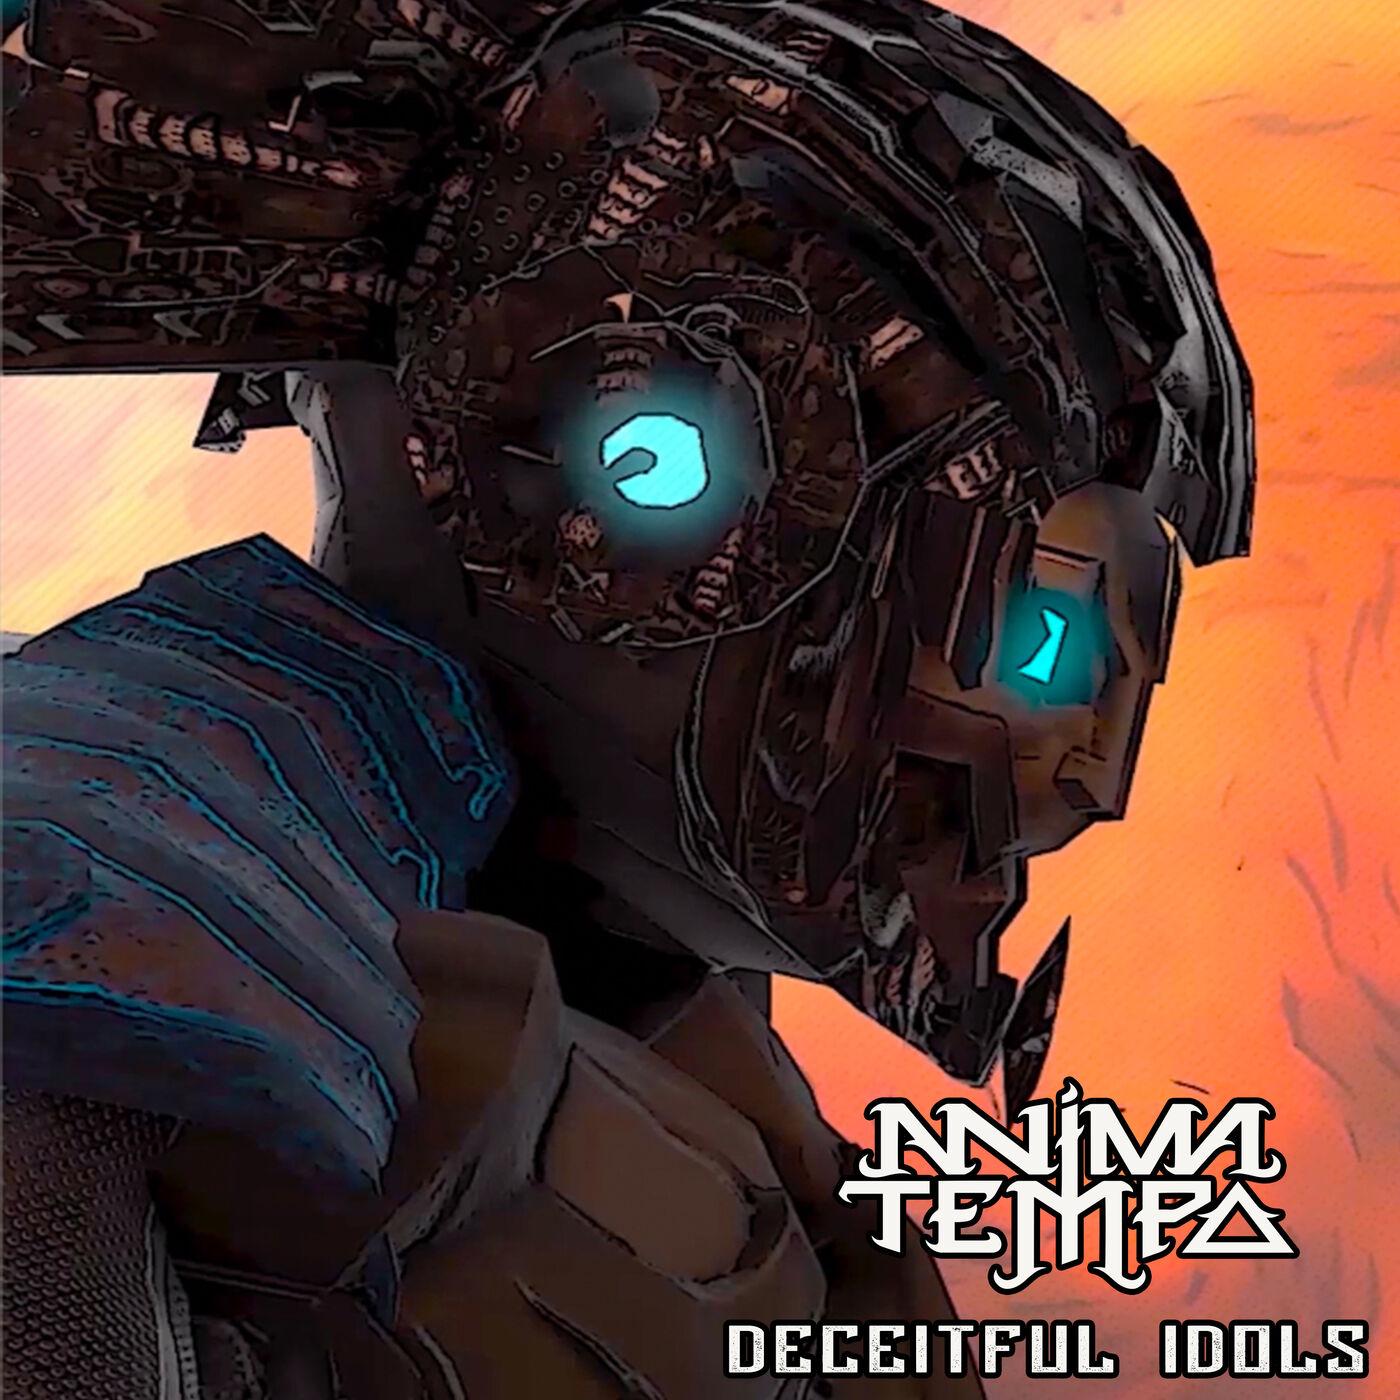 Anima Tempo - Deceitful Idols [single] (2020)